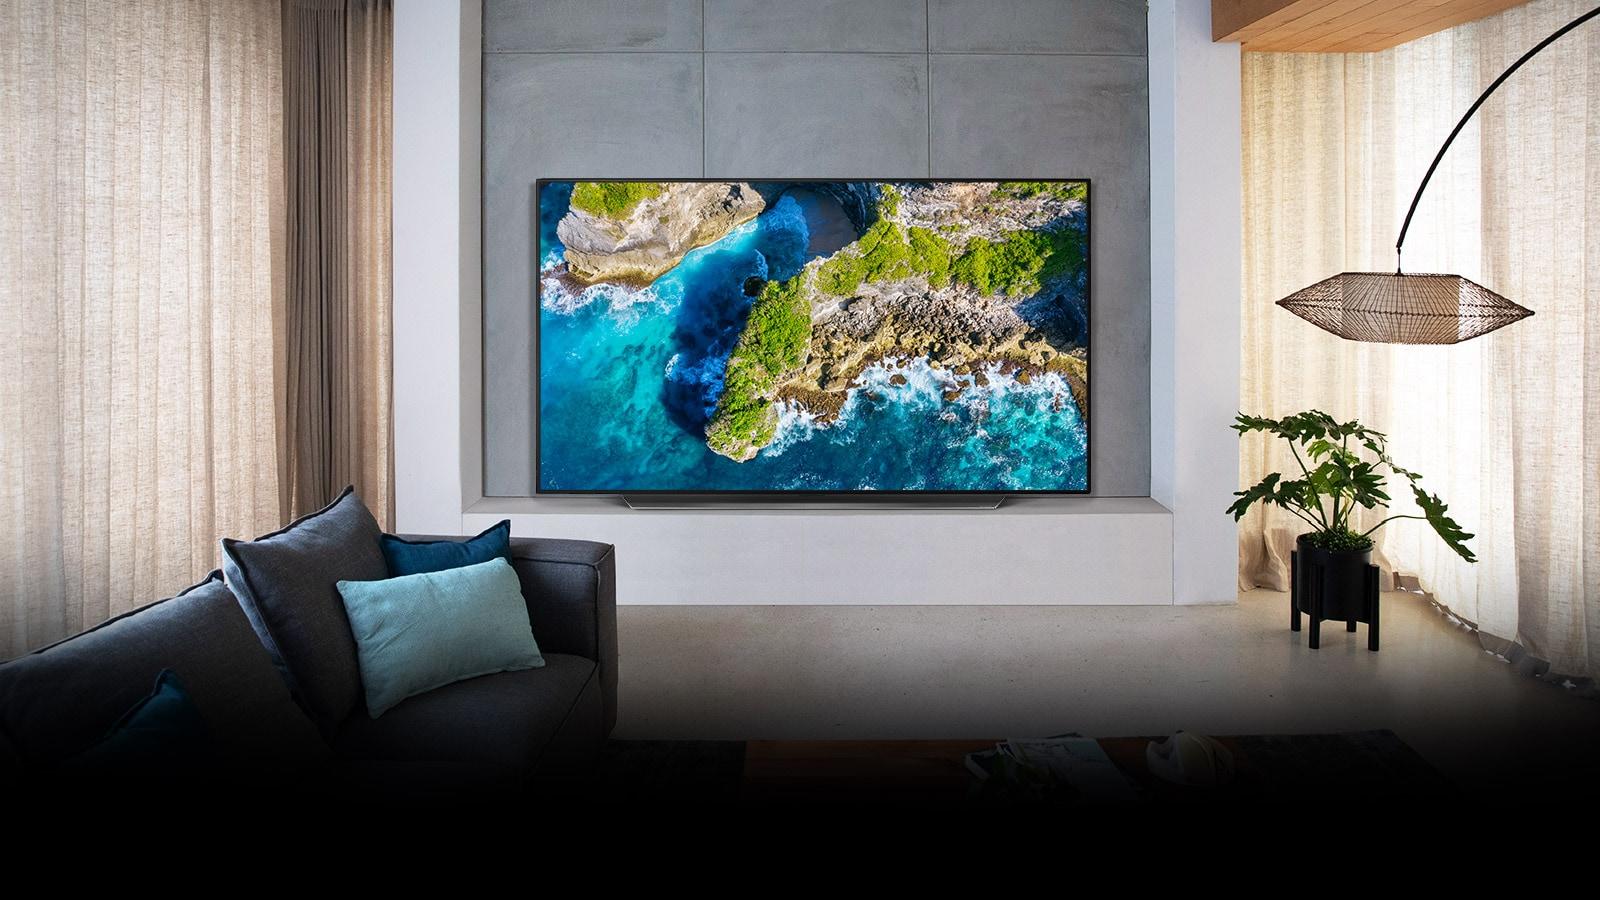 Televizor prikazuje pogled na prirodu iz perspektive luksuznog doma